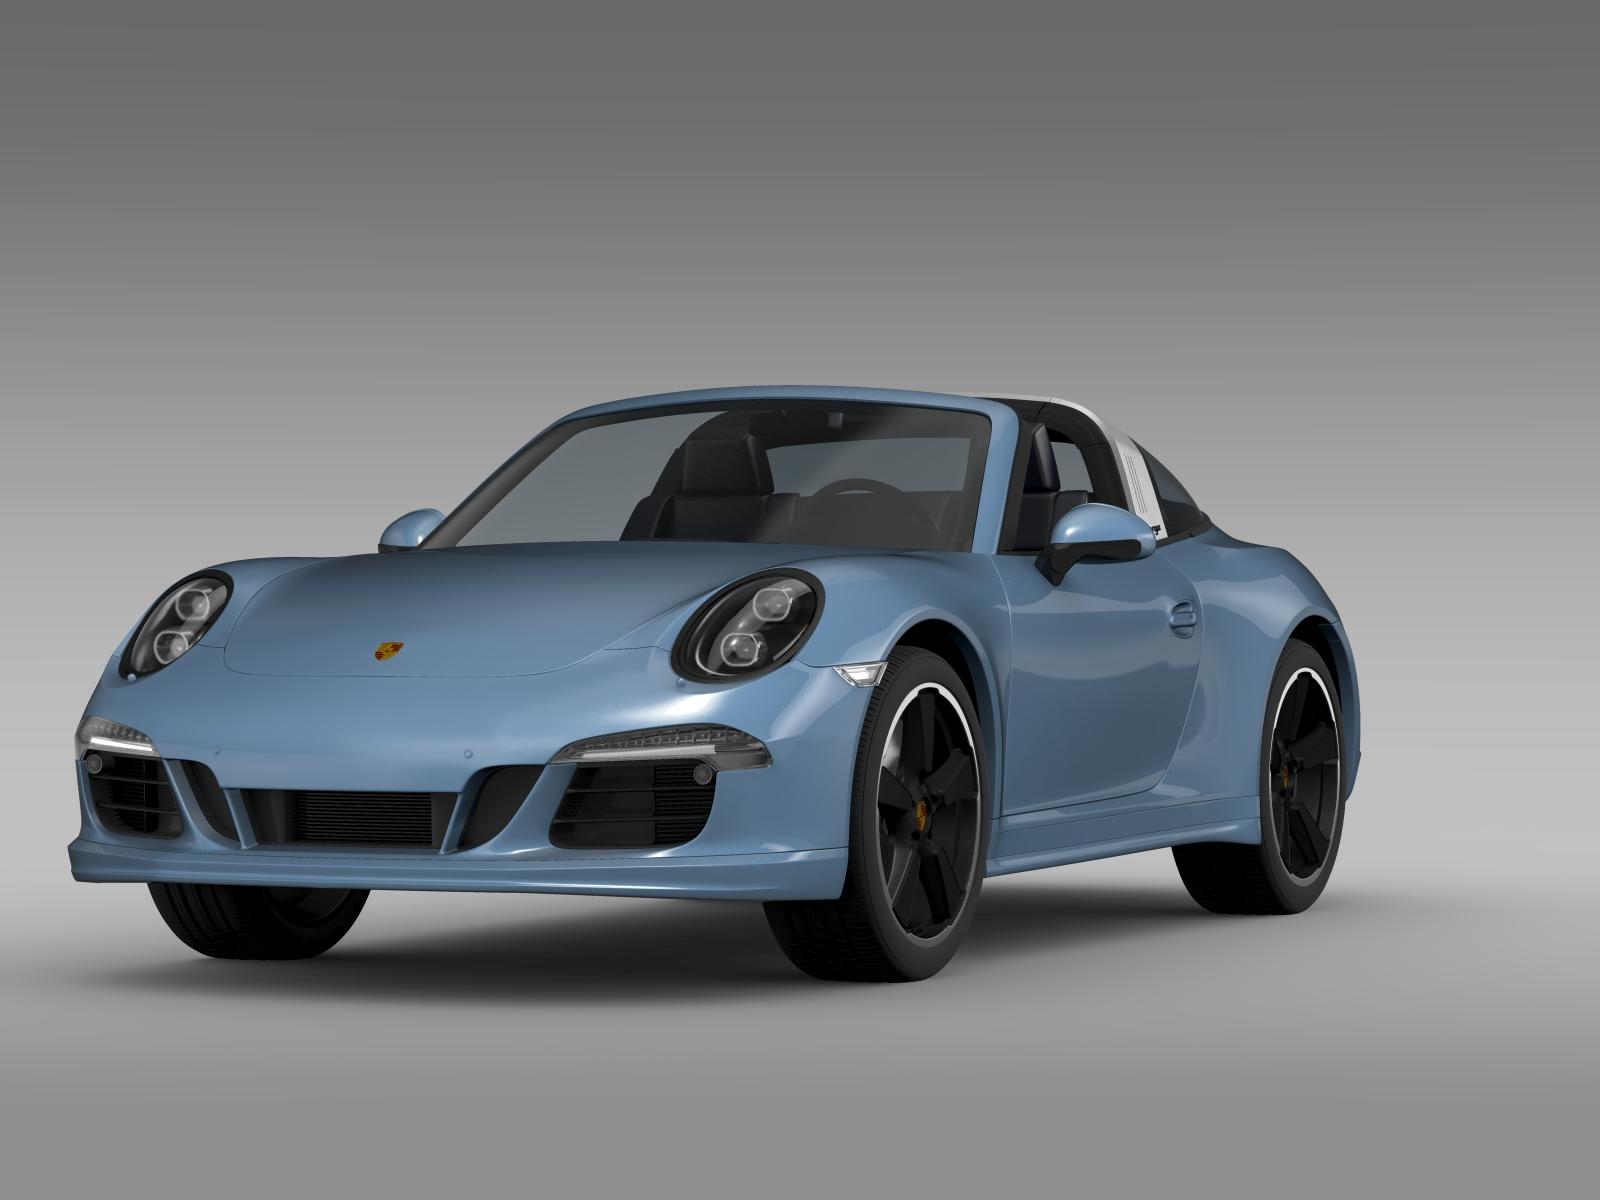 Porsche 911 Targa 4s Exclusive 2015 3d Model Buy Porsche